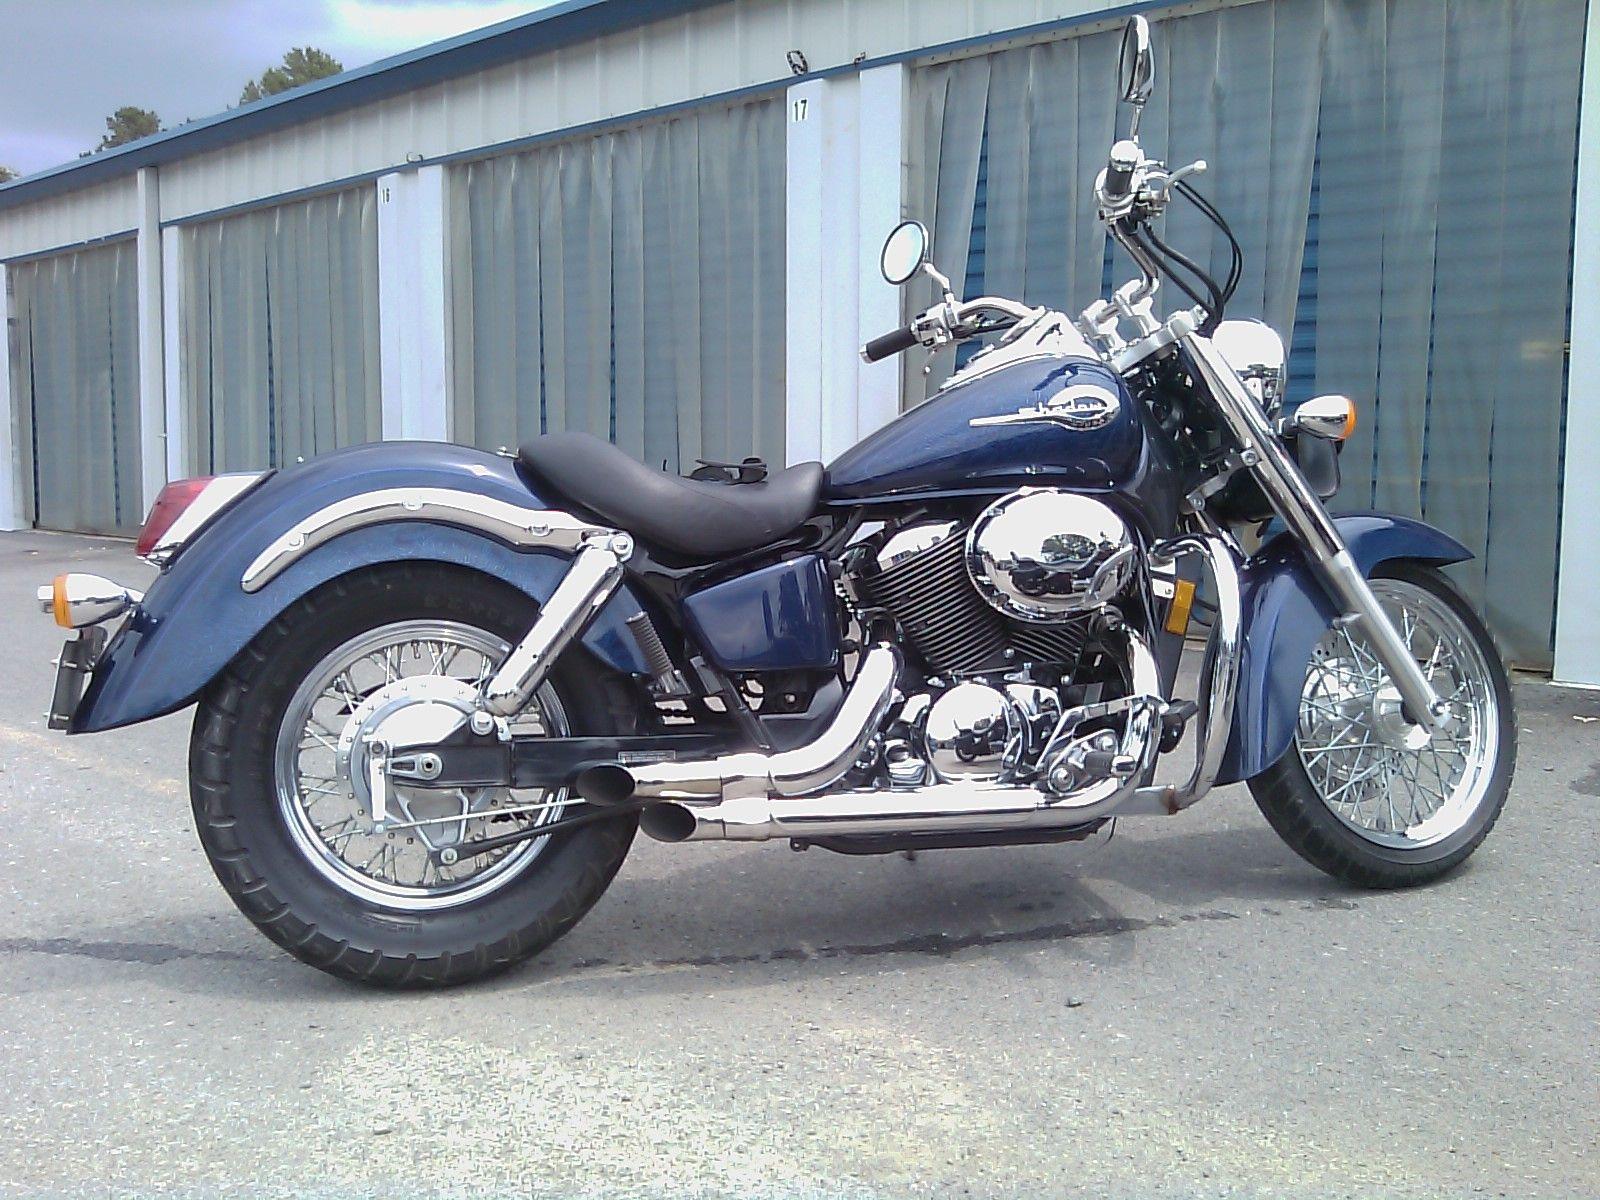 My Honda Vt750 Deluxe Shadow Ace Motorcycles Motorcycle Honda